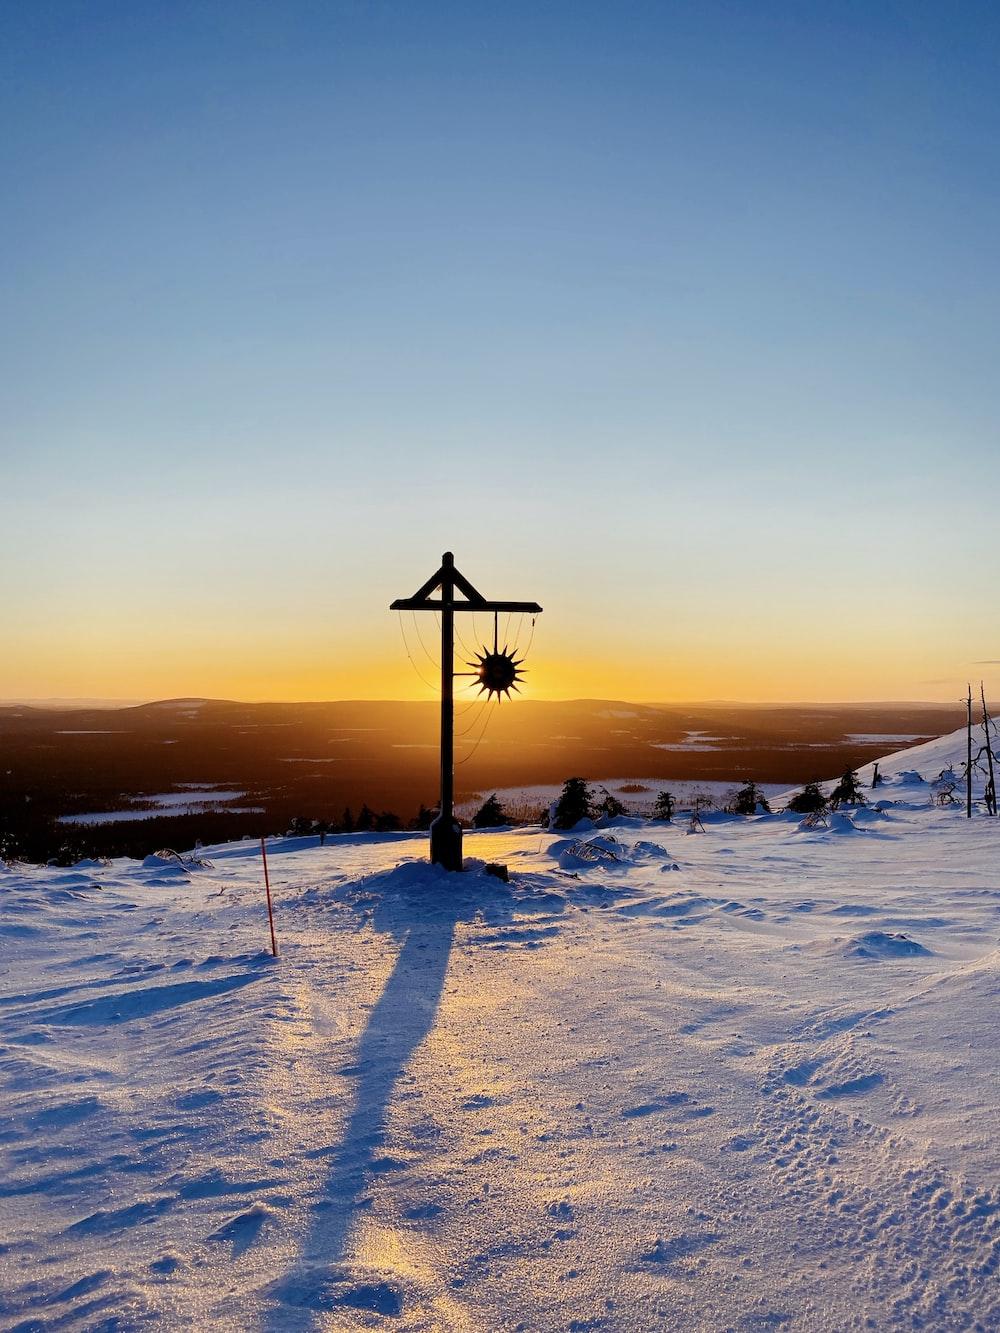 black street light on snow covered ground during sunset